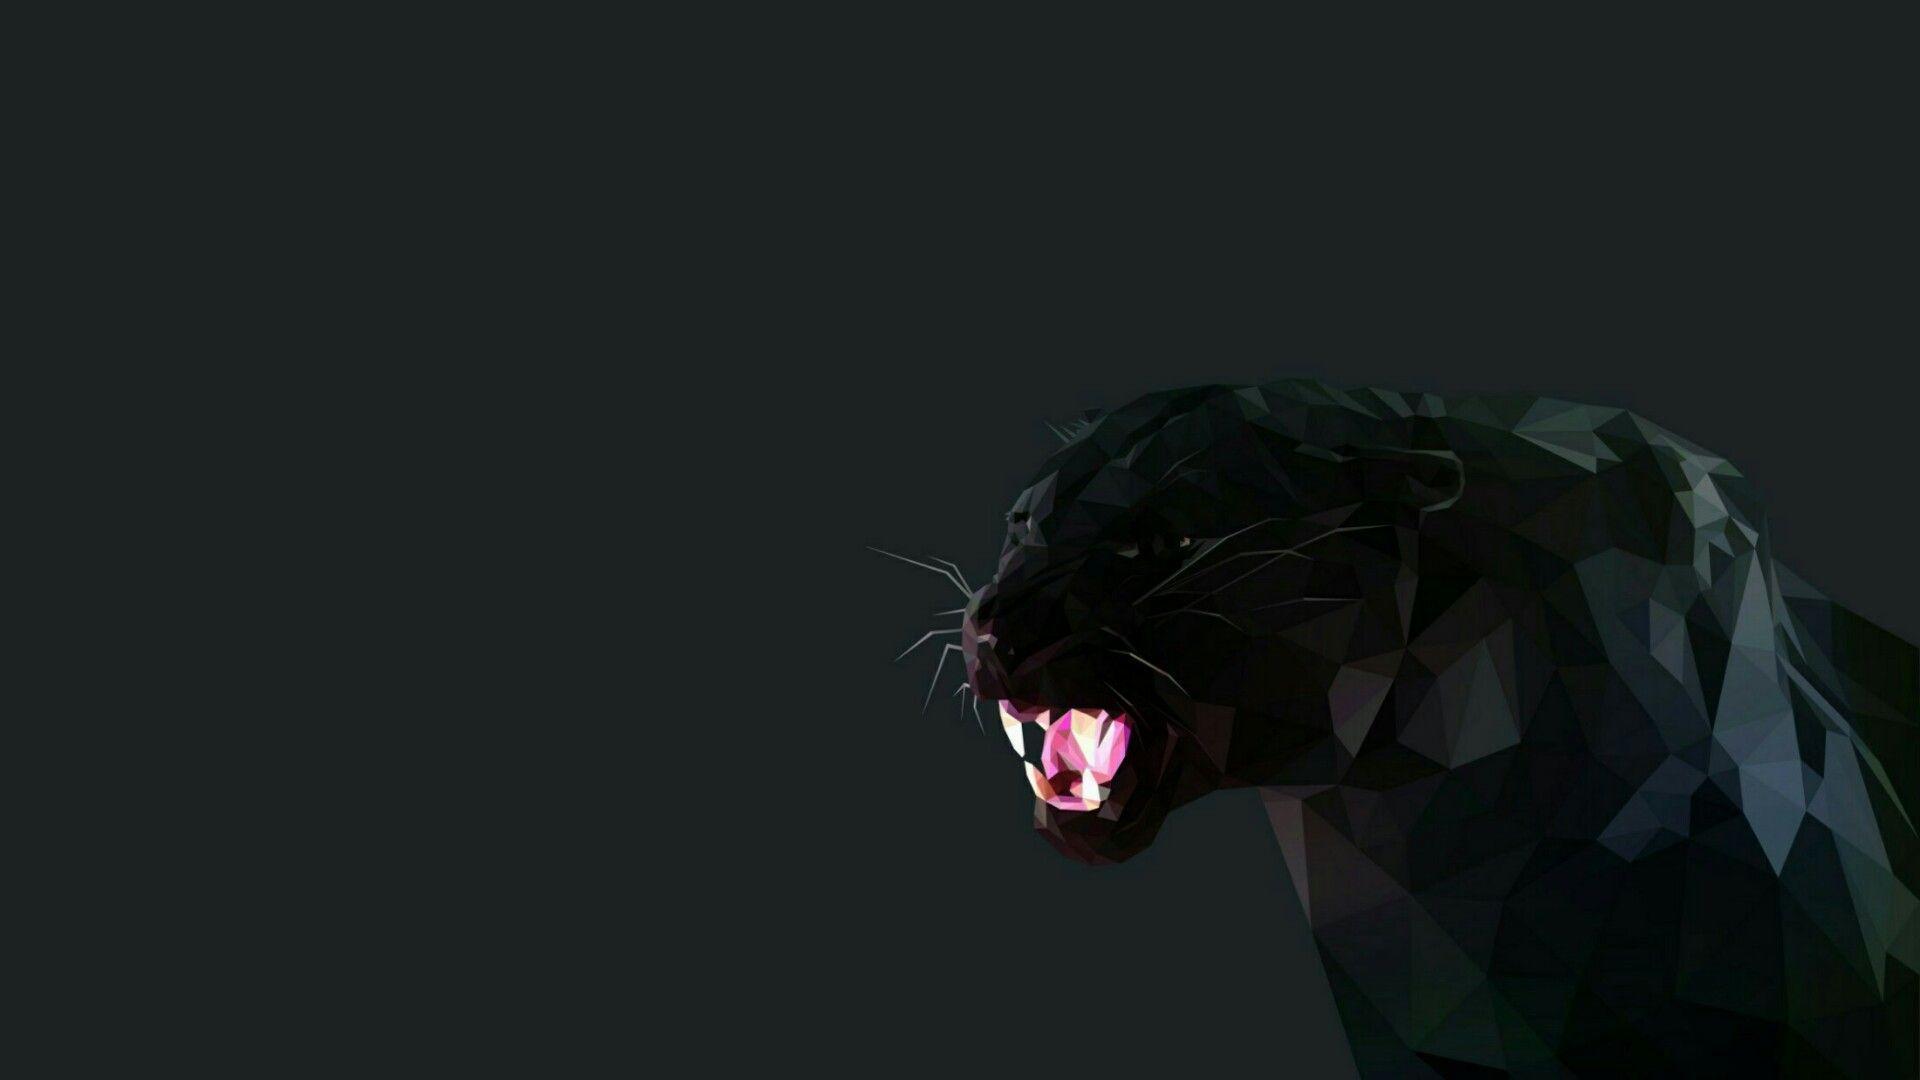 Black Panther 4K Wallpapers - Wallpaper Cave